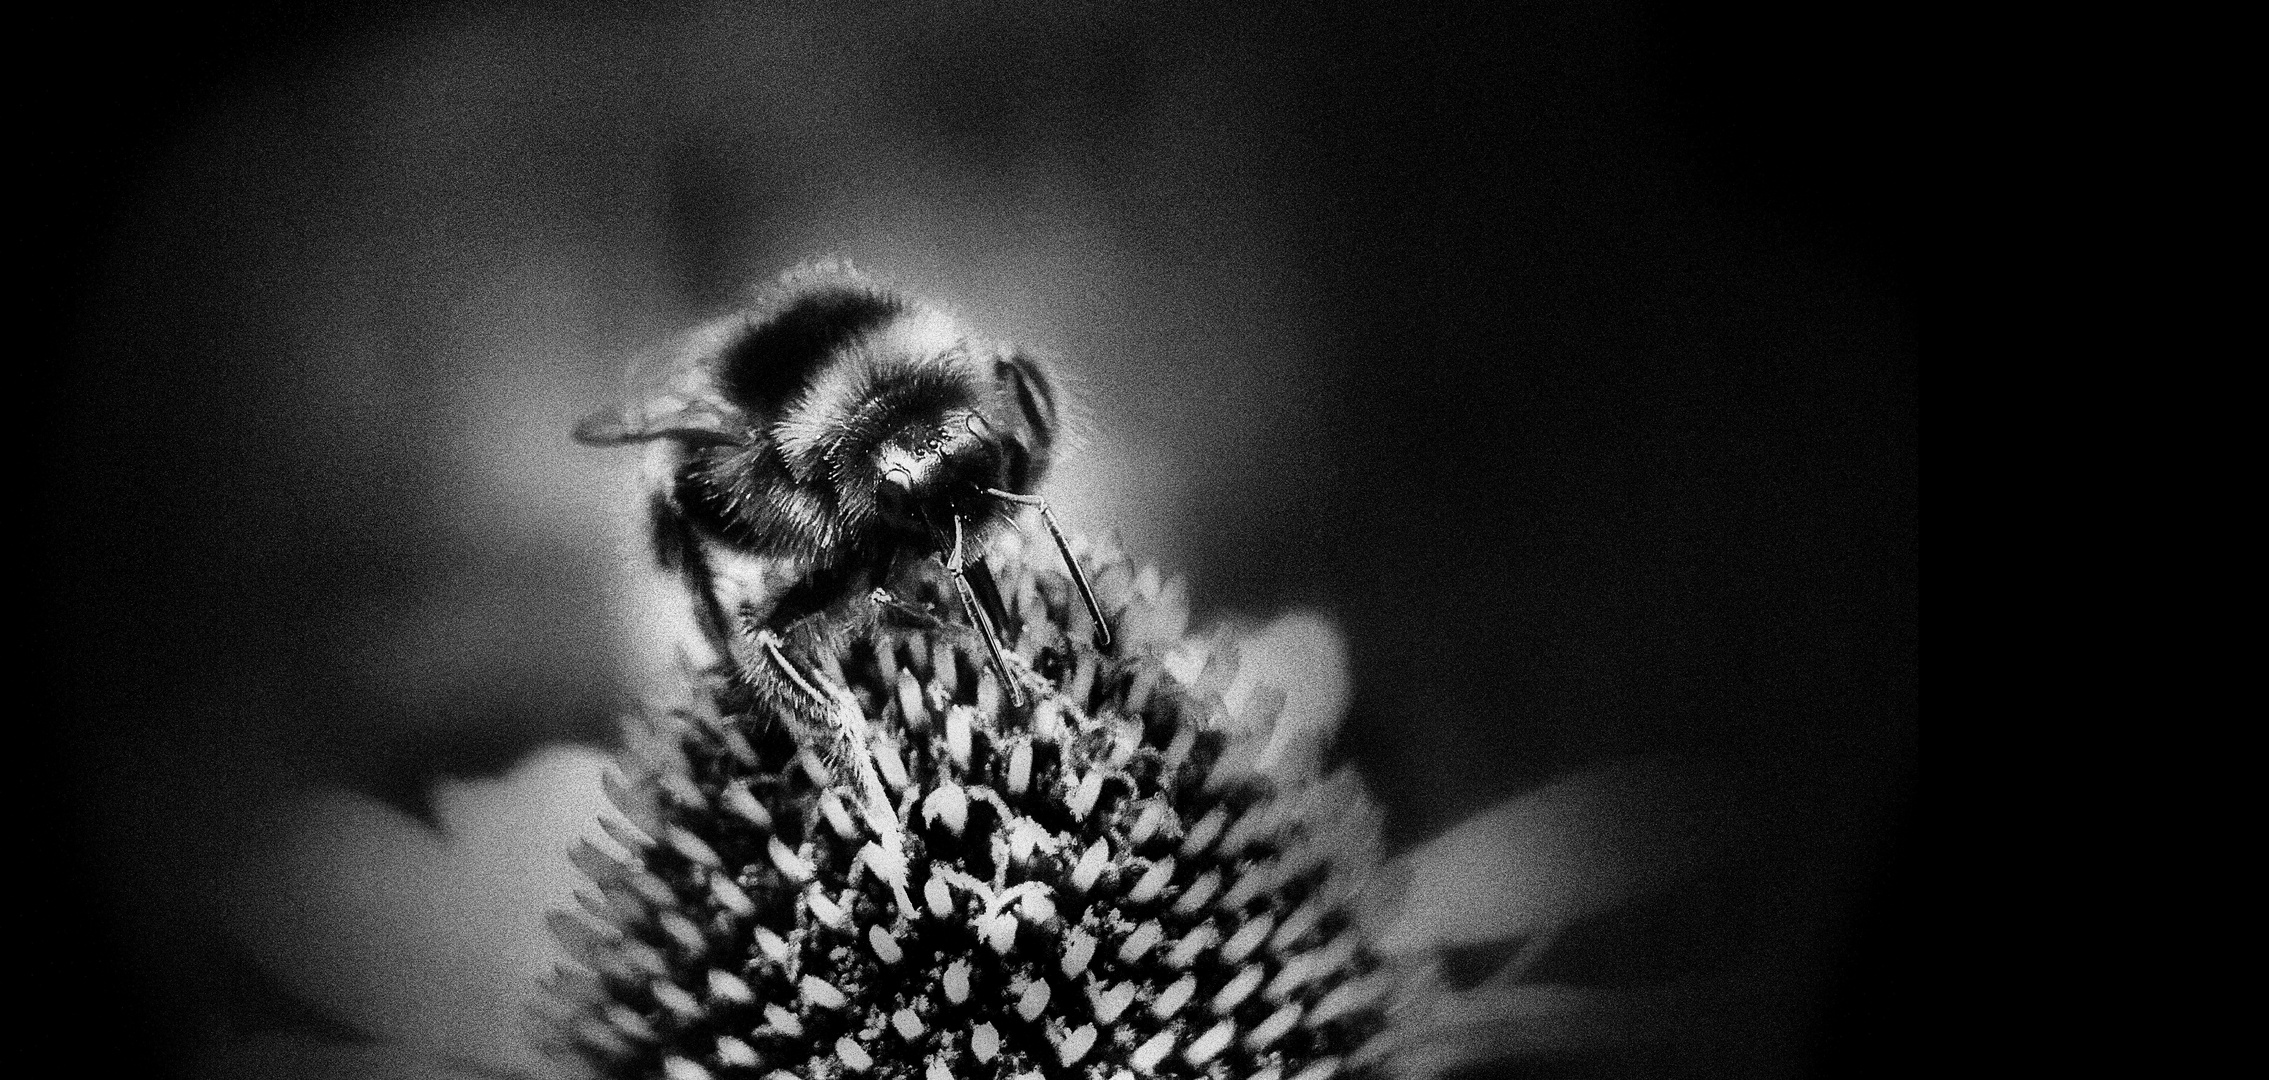 ... bumblebee on flower